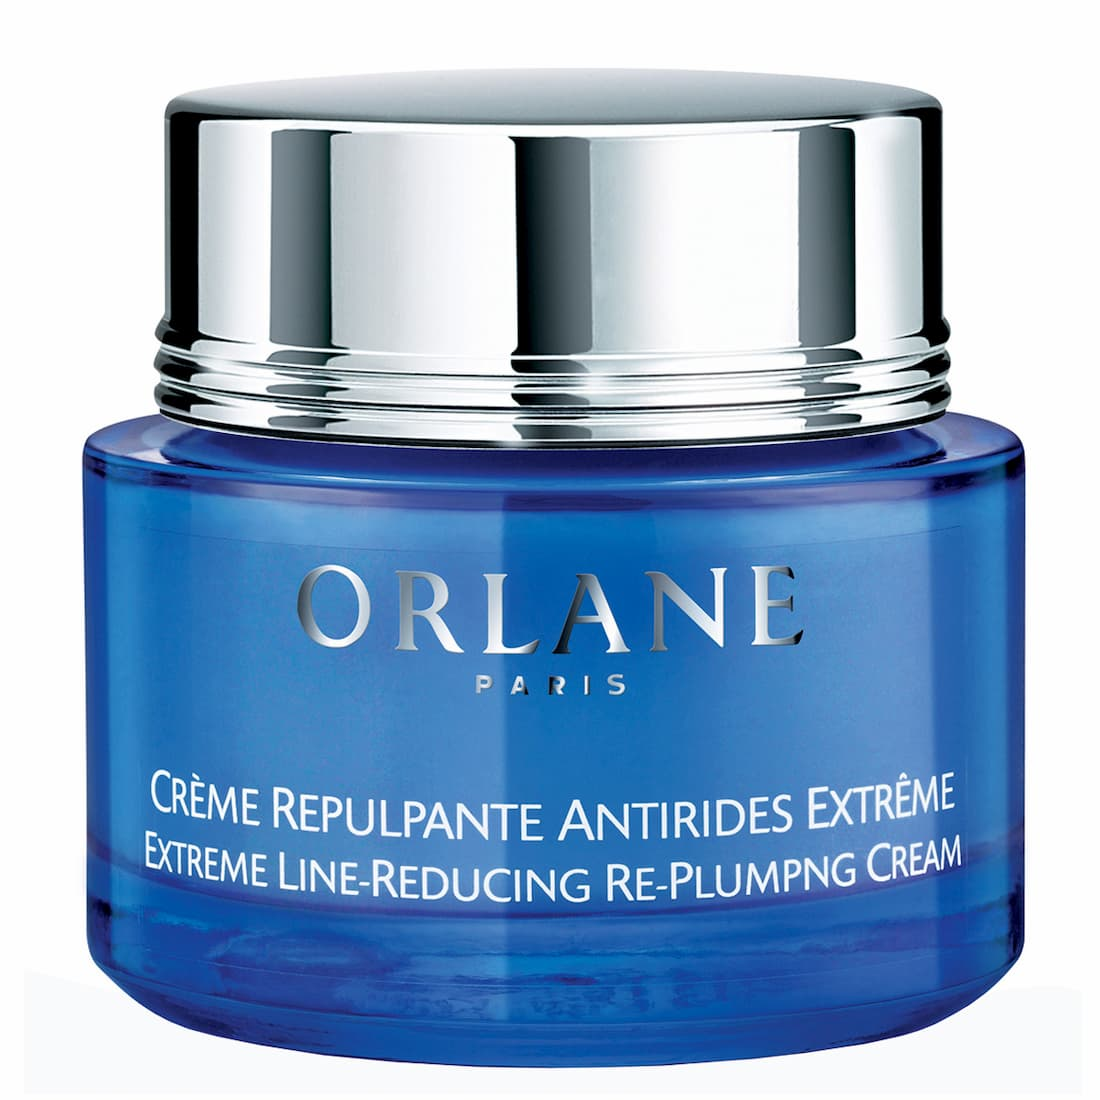 Orlane - Crème Repulpante Antirides Extrême - Pot 50 ml